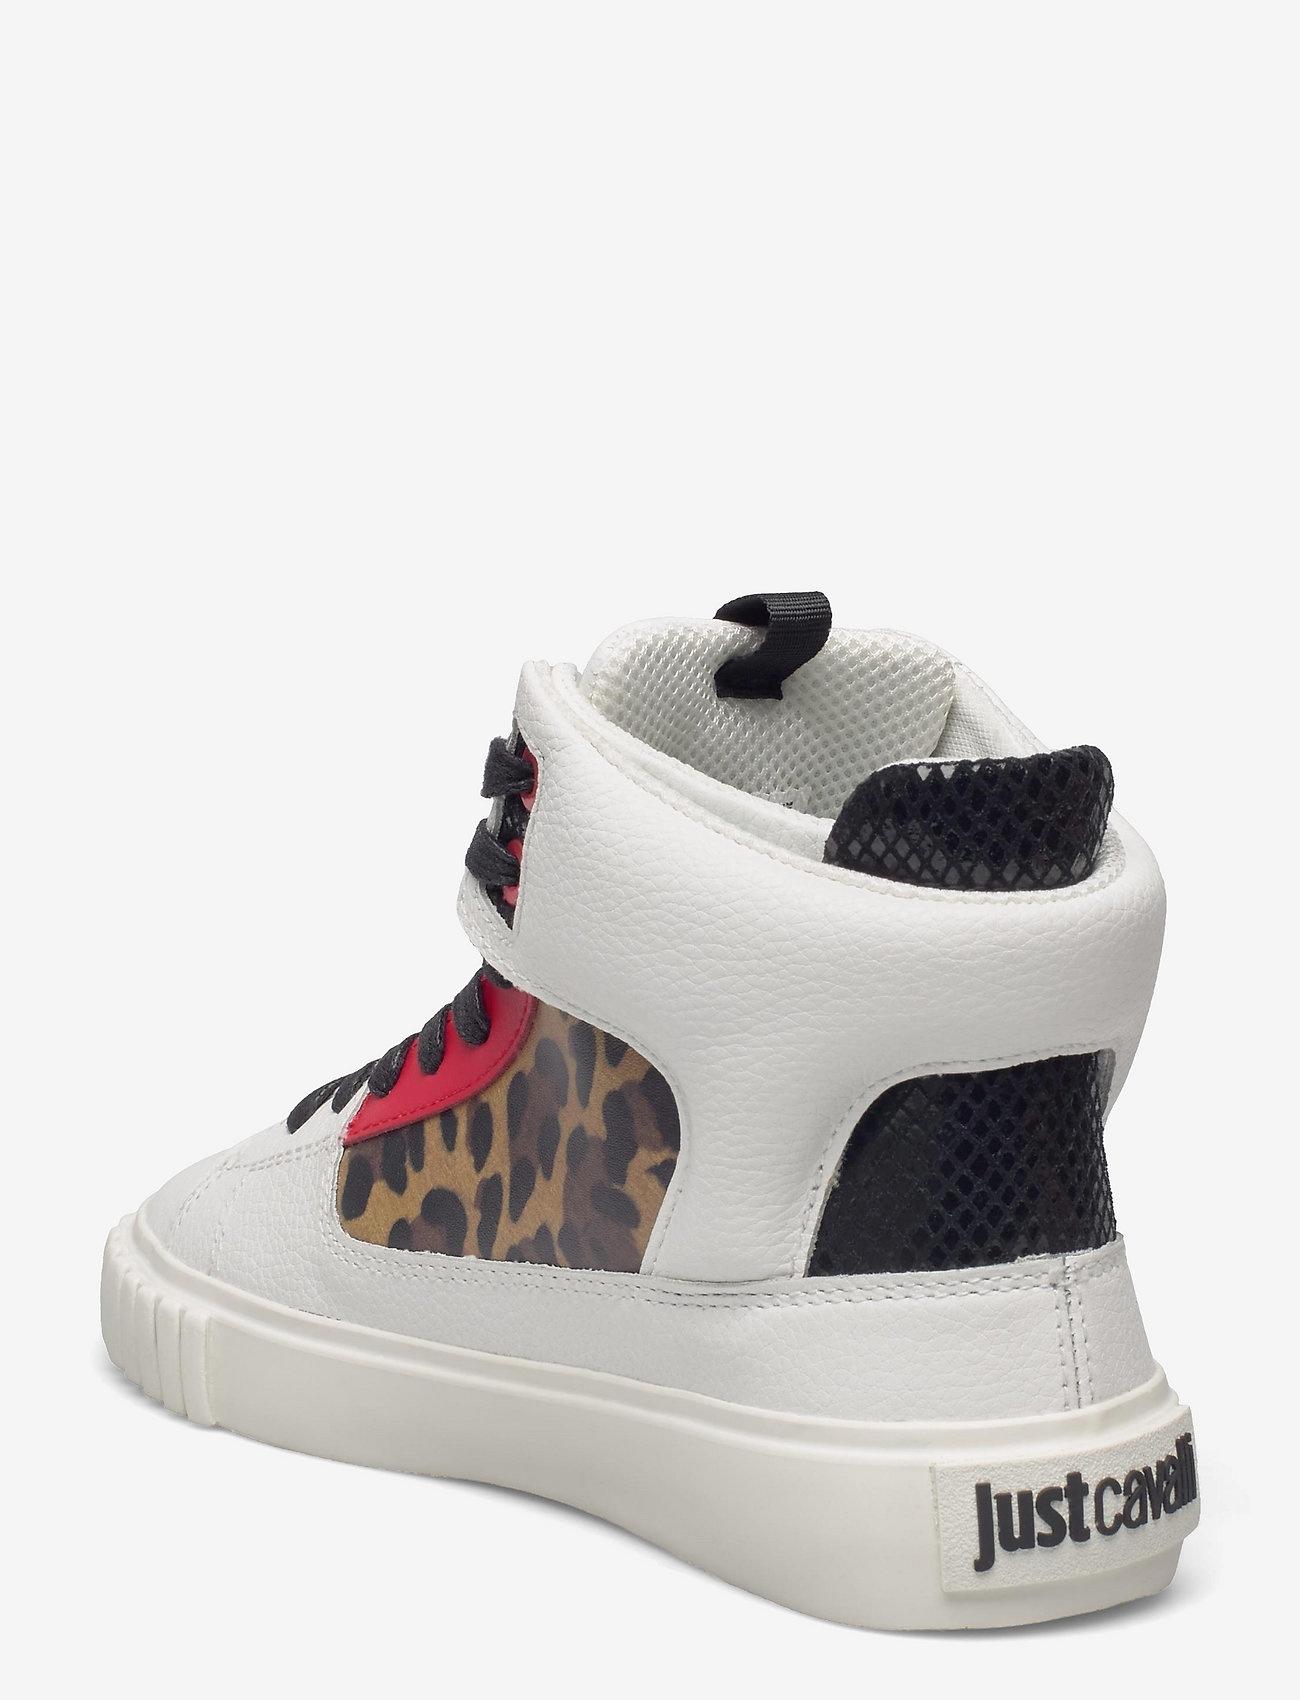 Just Cavalli Dames sneakers, multi